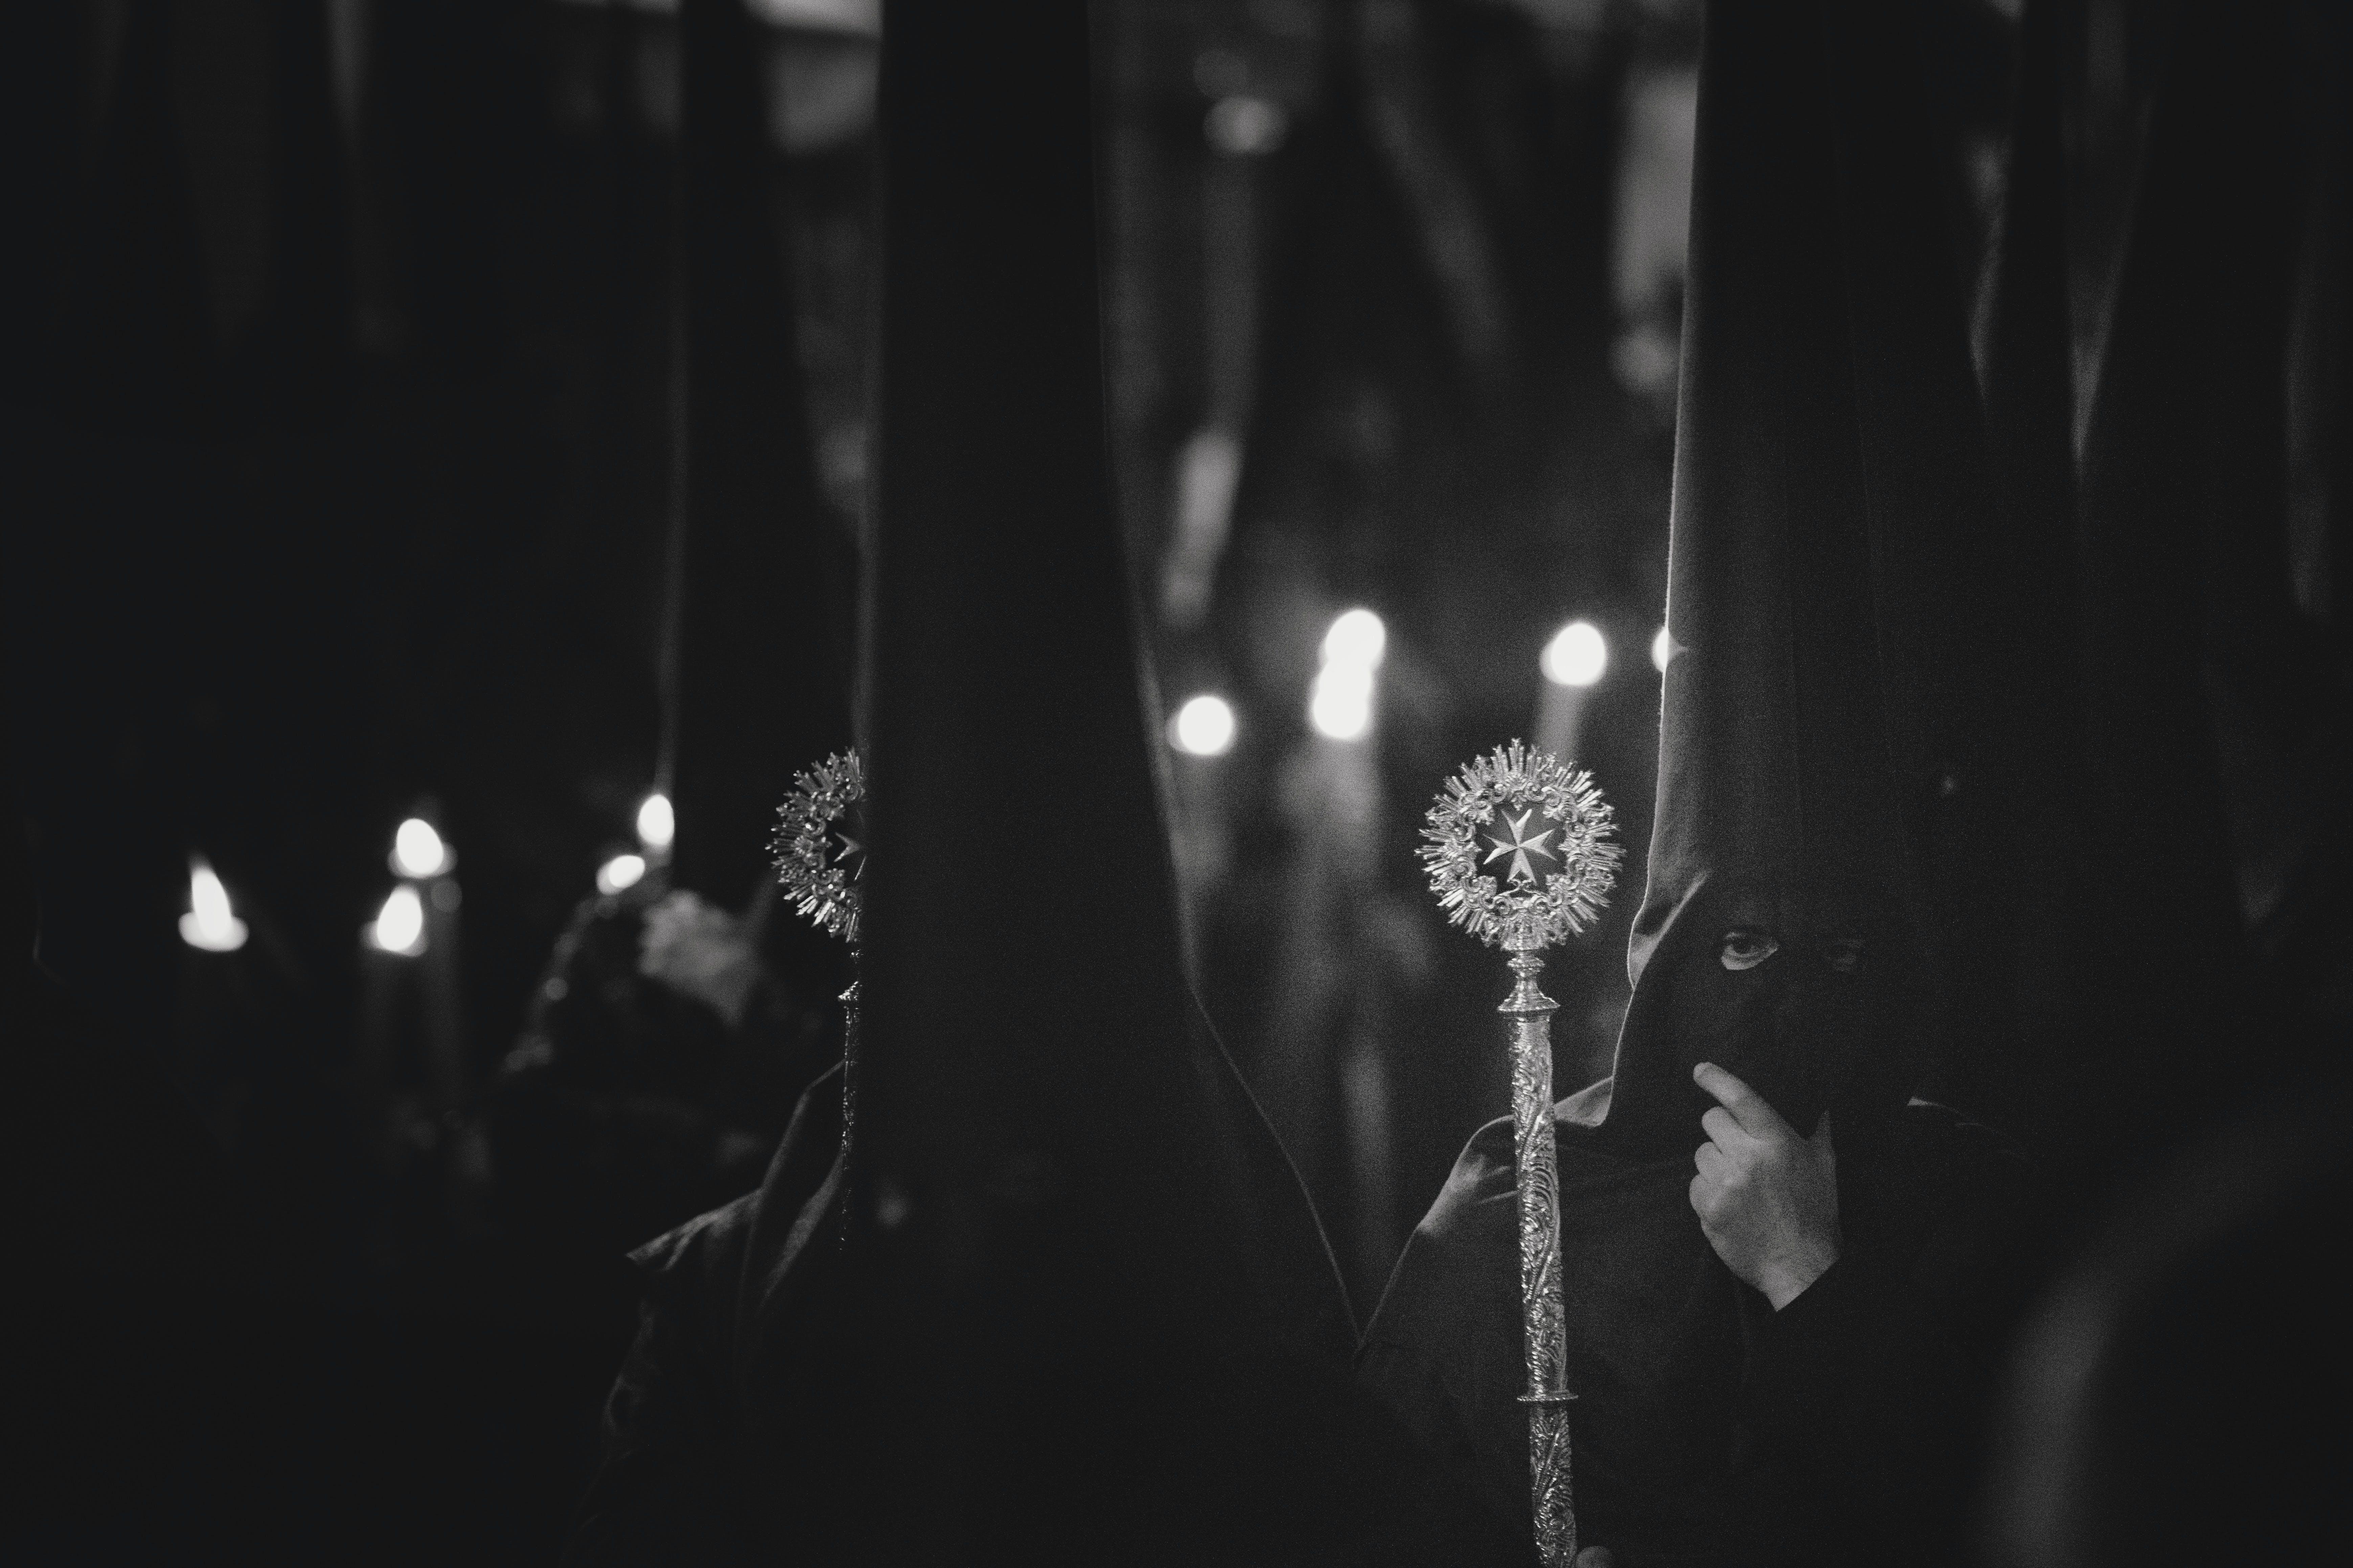 Grayscale Photo of Person Wearing Balaclava Holding Wand